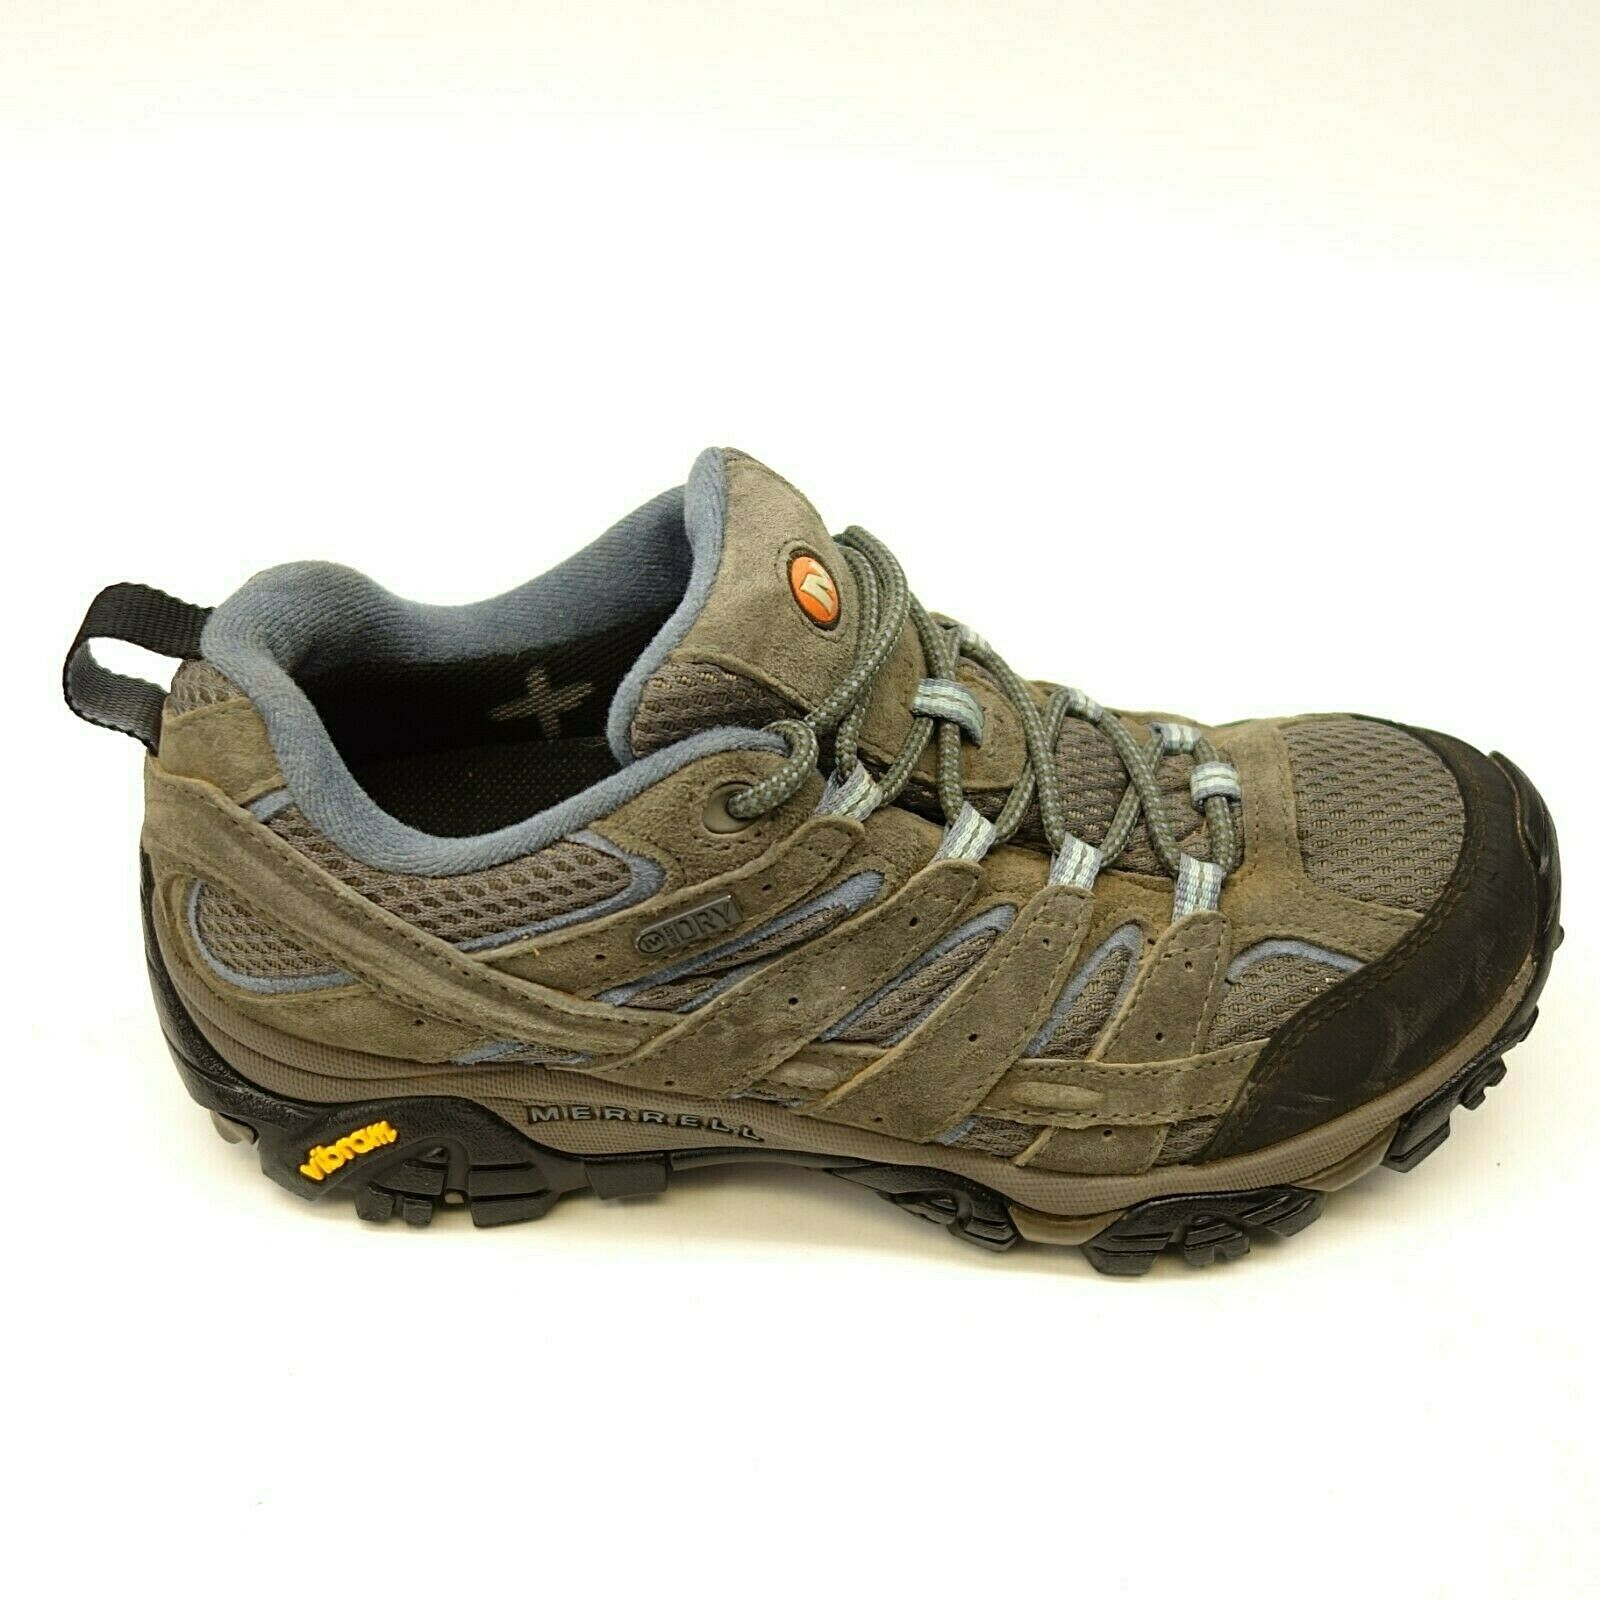 Merrell Moab 2 Low US 8 Eu 38,5 Wandern Wp Granit Grau Damen Stiefel